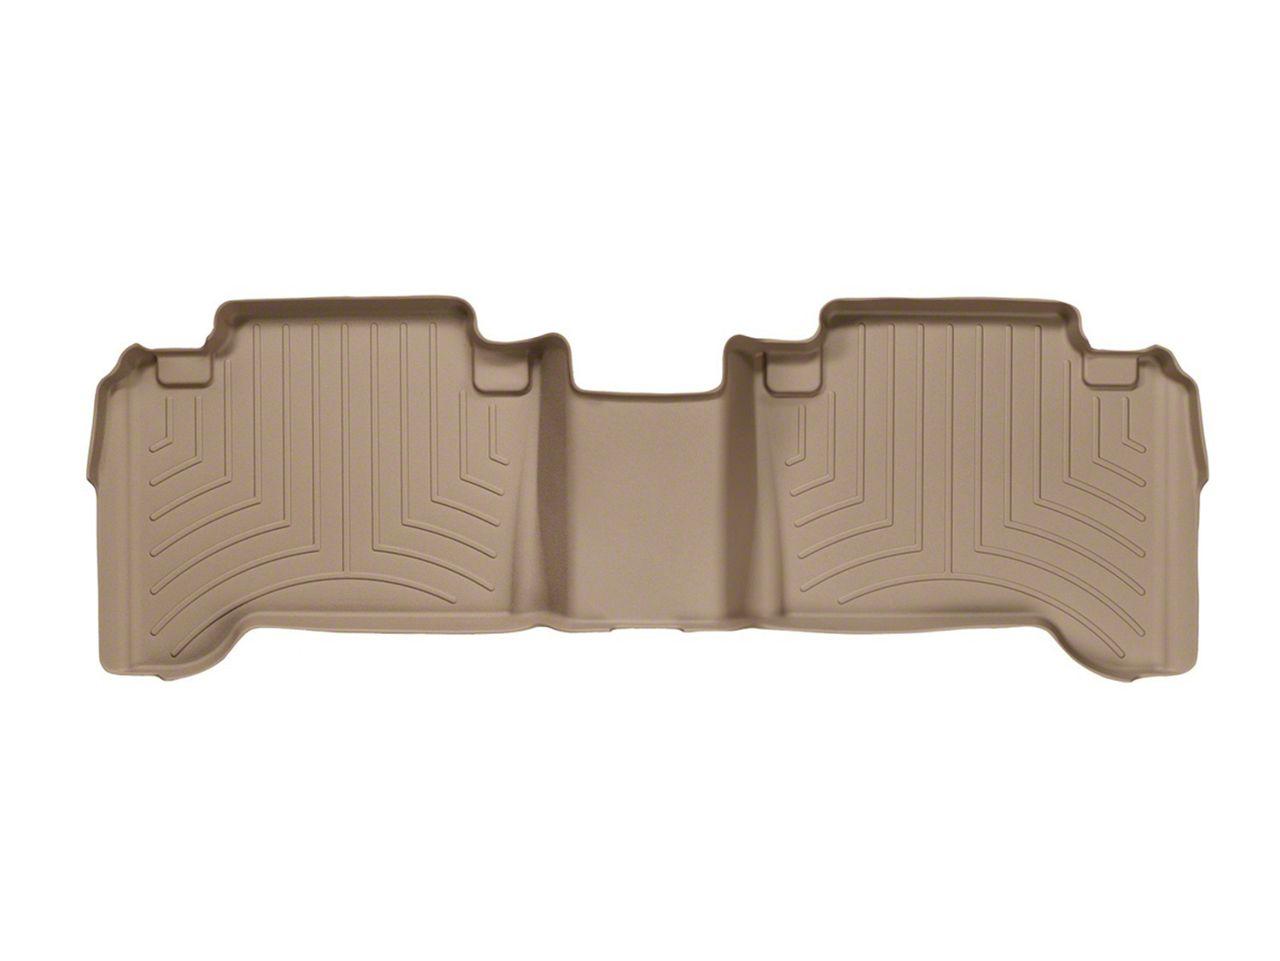 Weathertech DigitalFit Rear Floor Liner - Tan (05-15 Tacoma Double Cab)